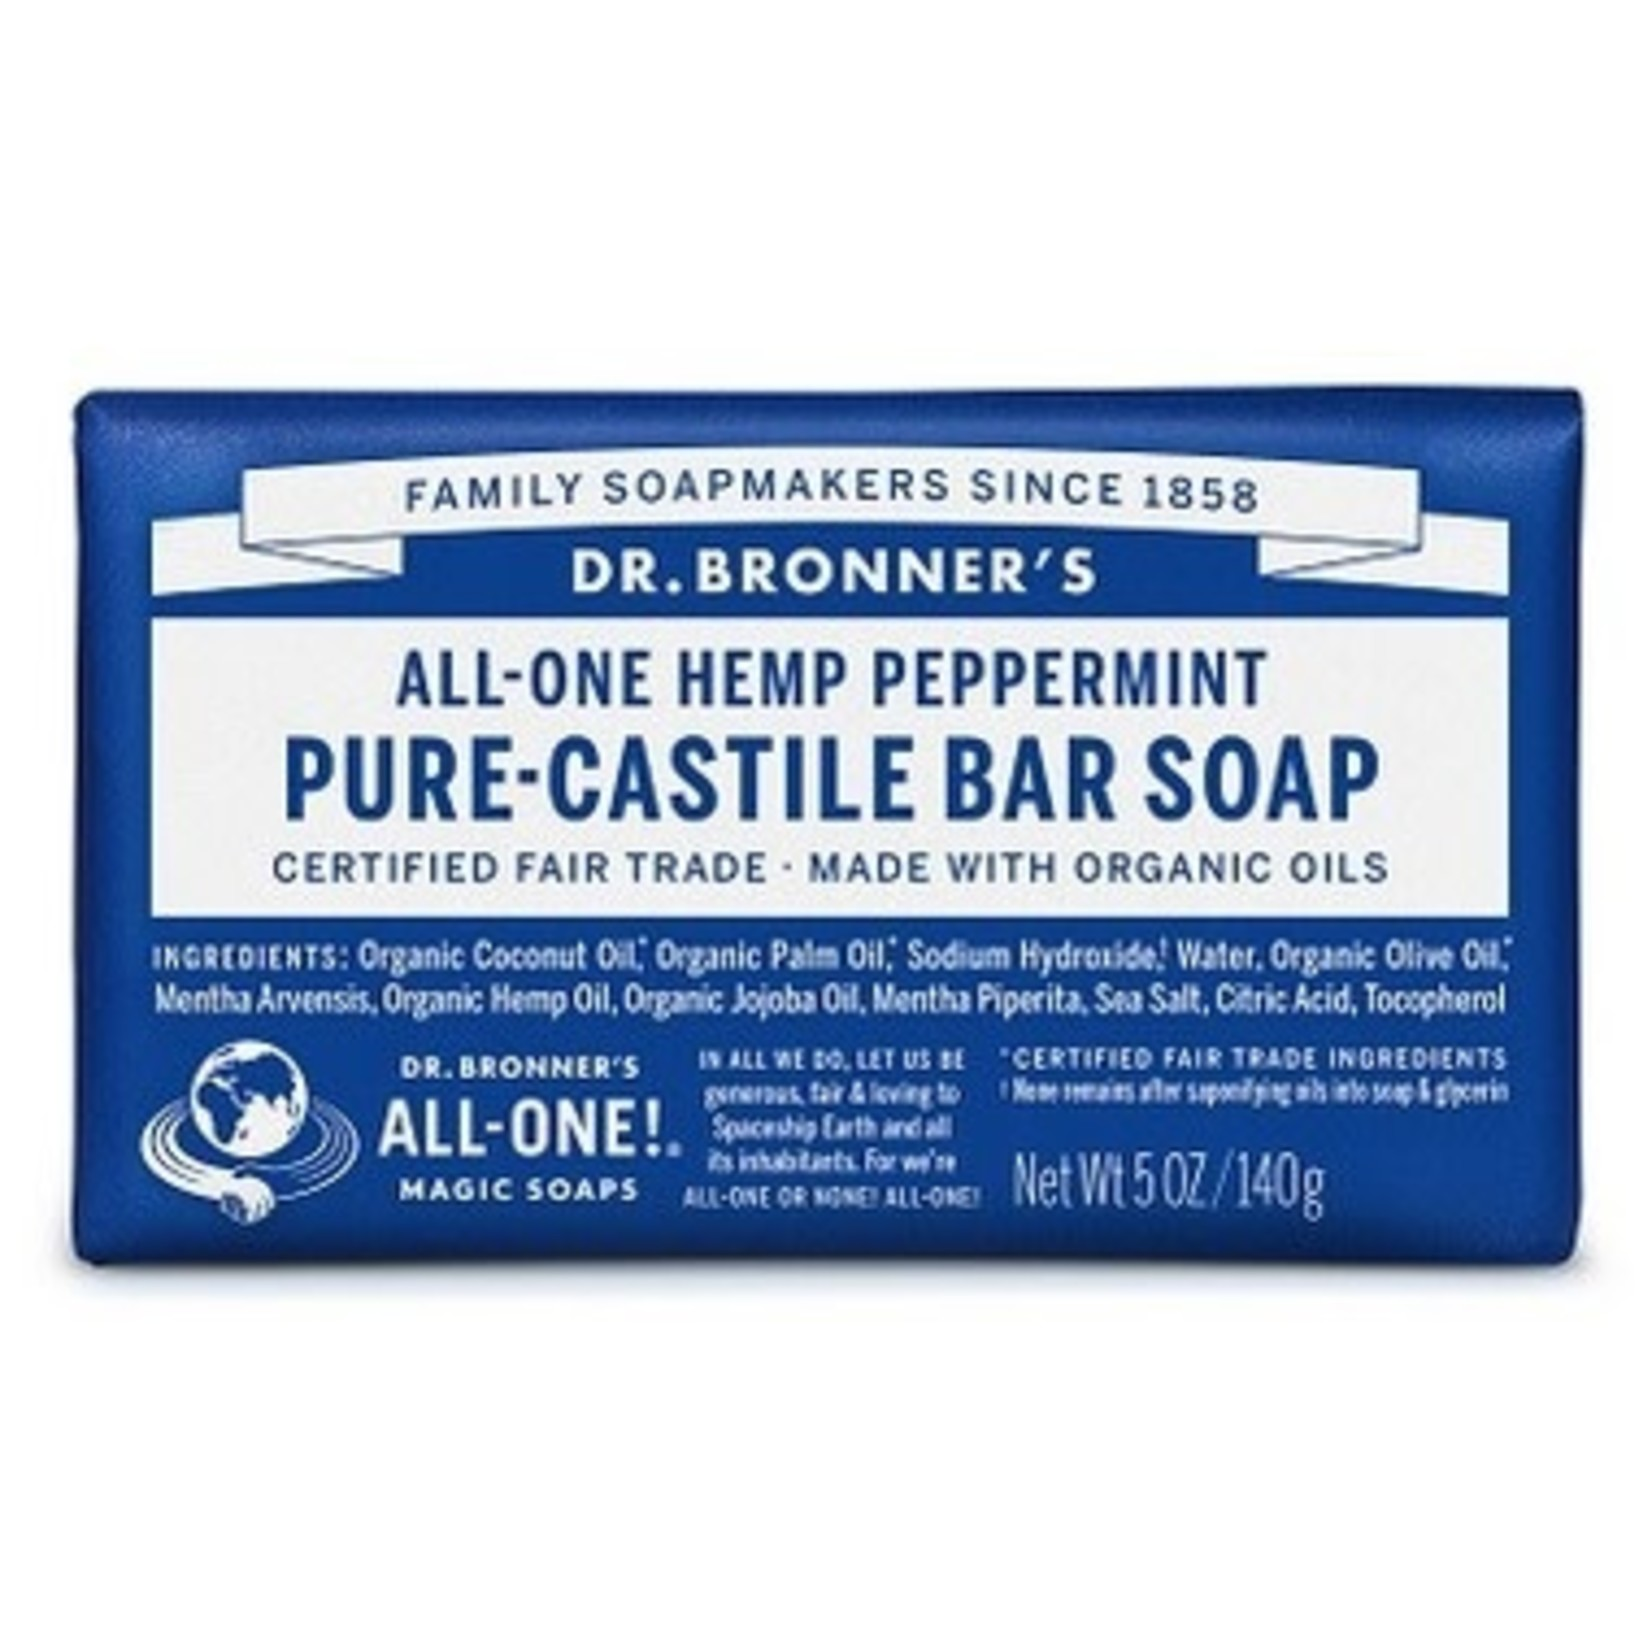 DR. BRONNER'S PURE CASTILE SOAP - PEPPERMINT